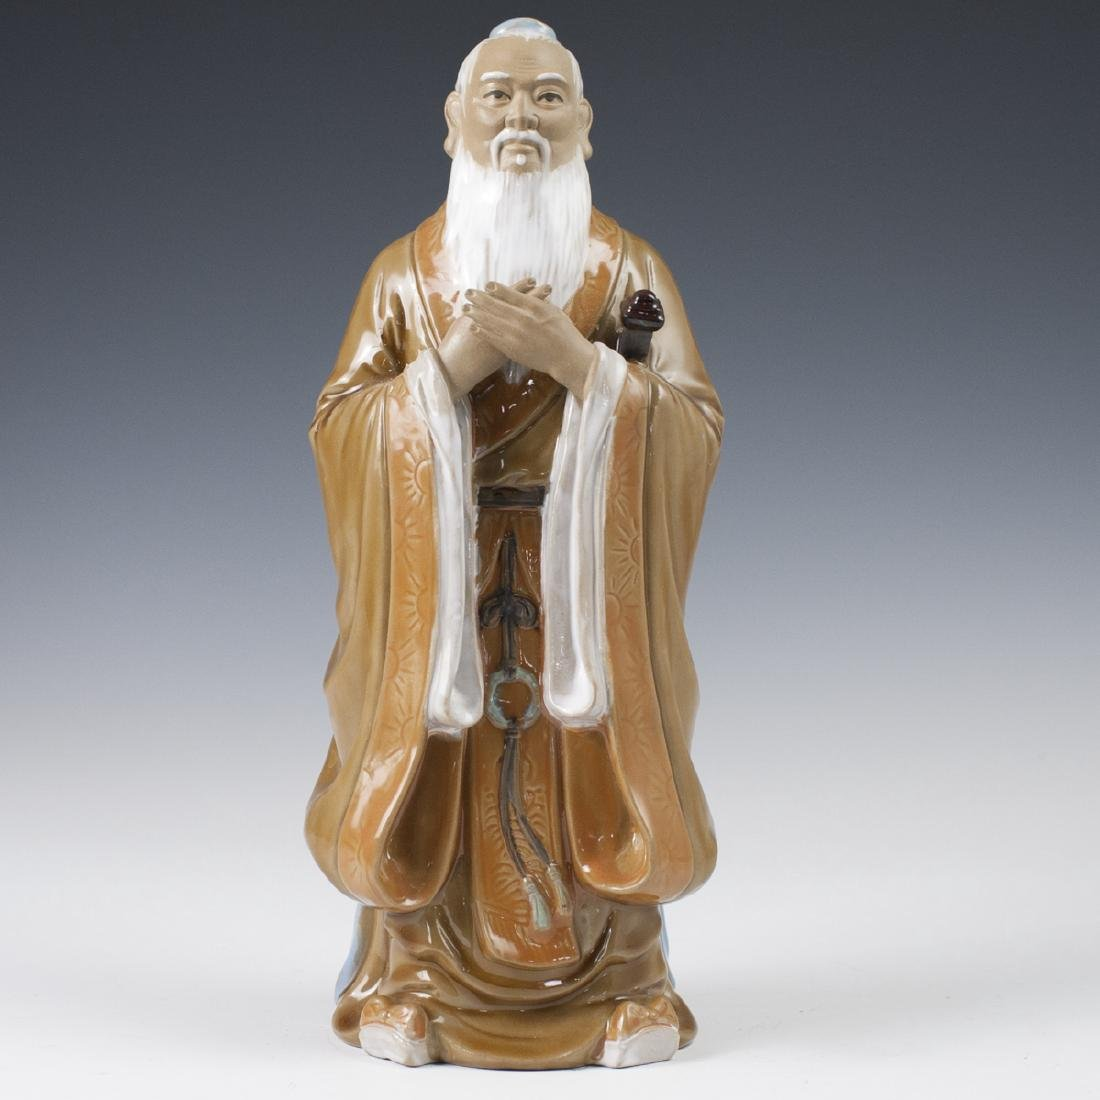 Chinese Glazed Ceramic Mudmen Figurines - 3